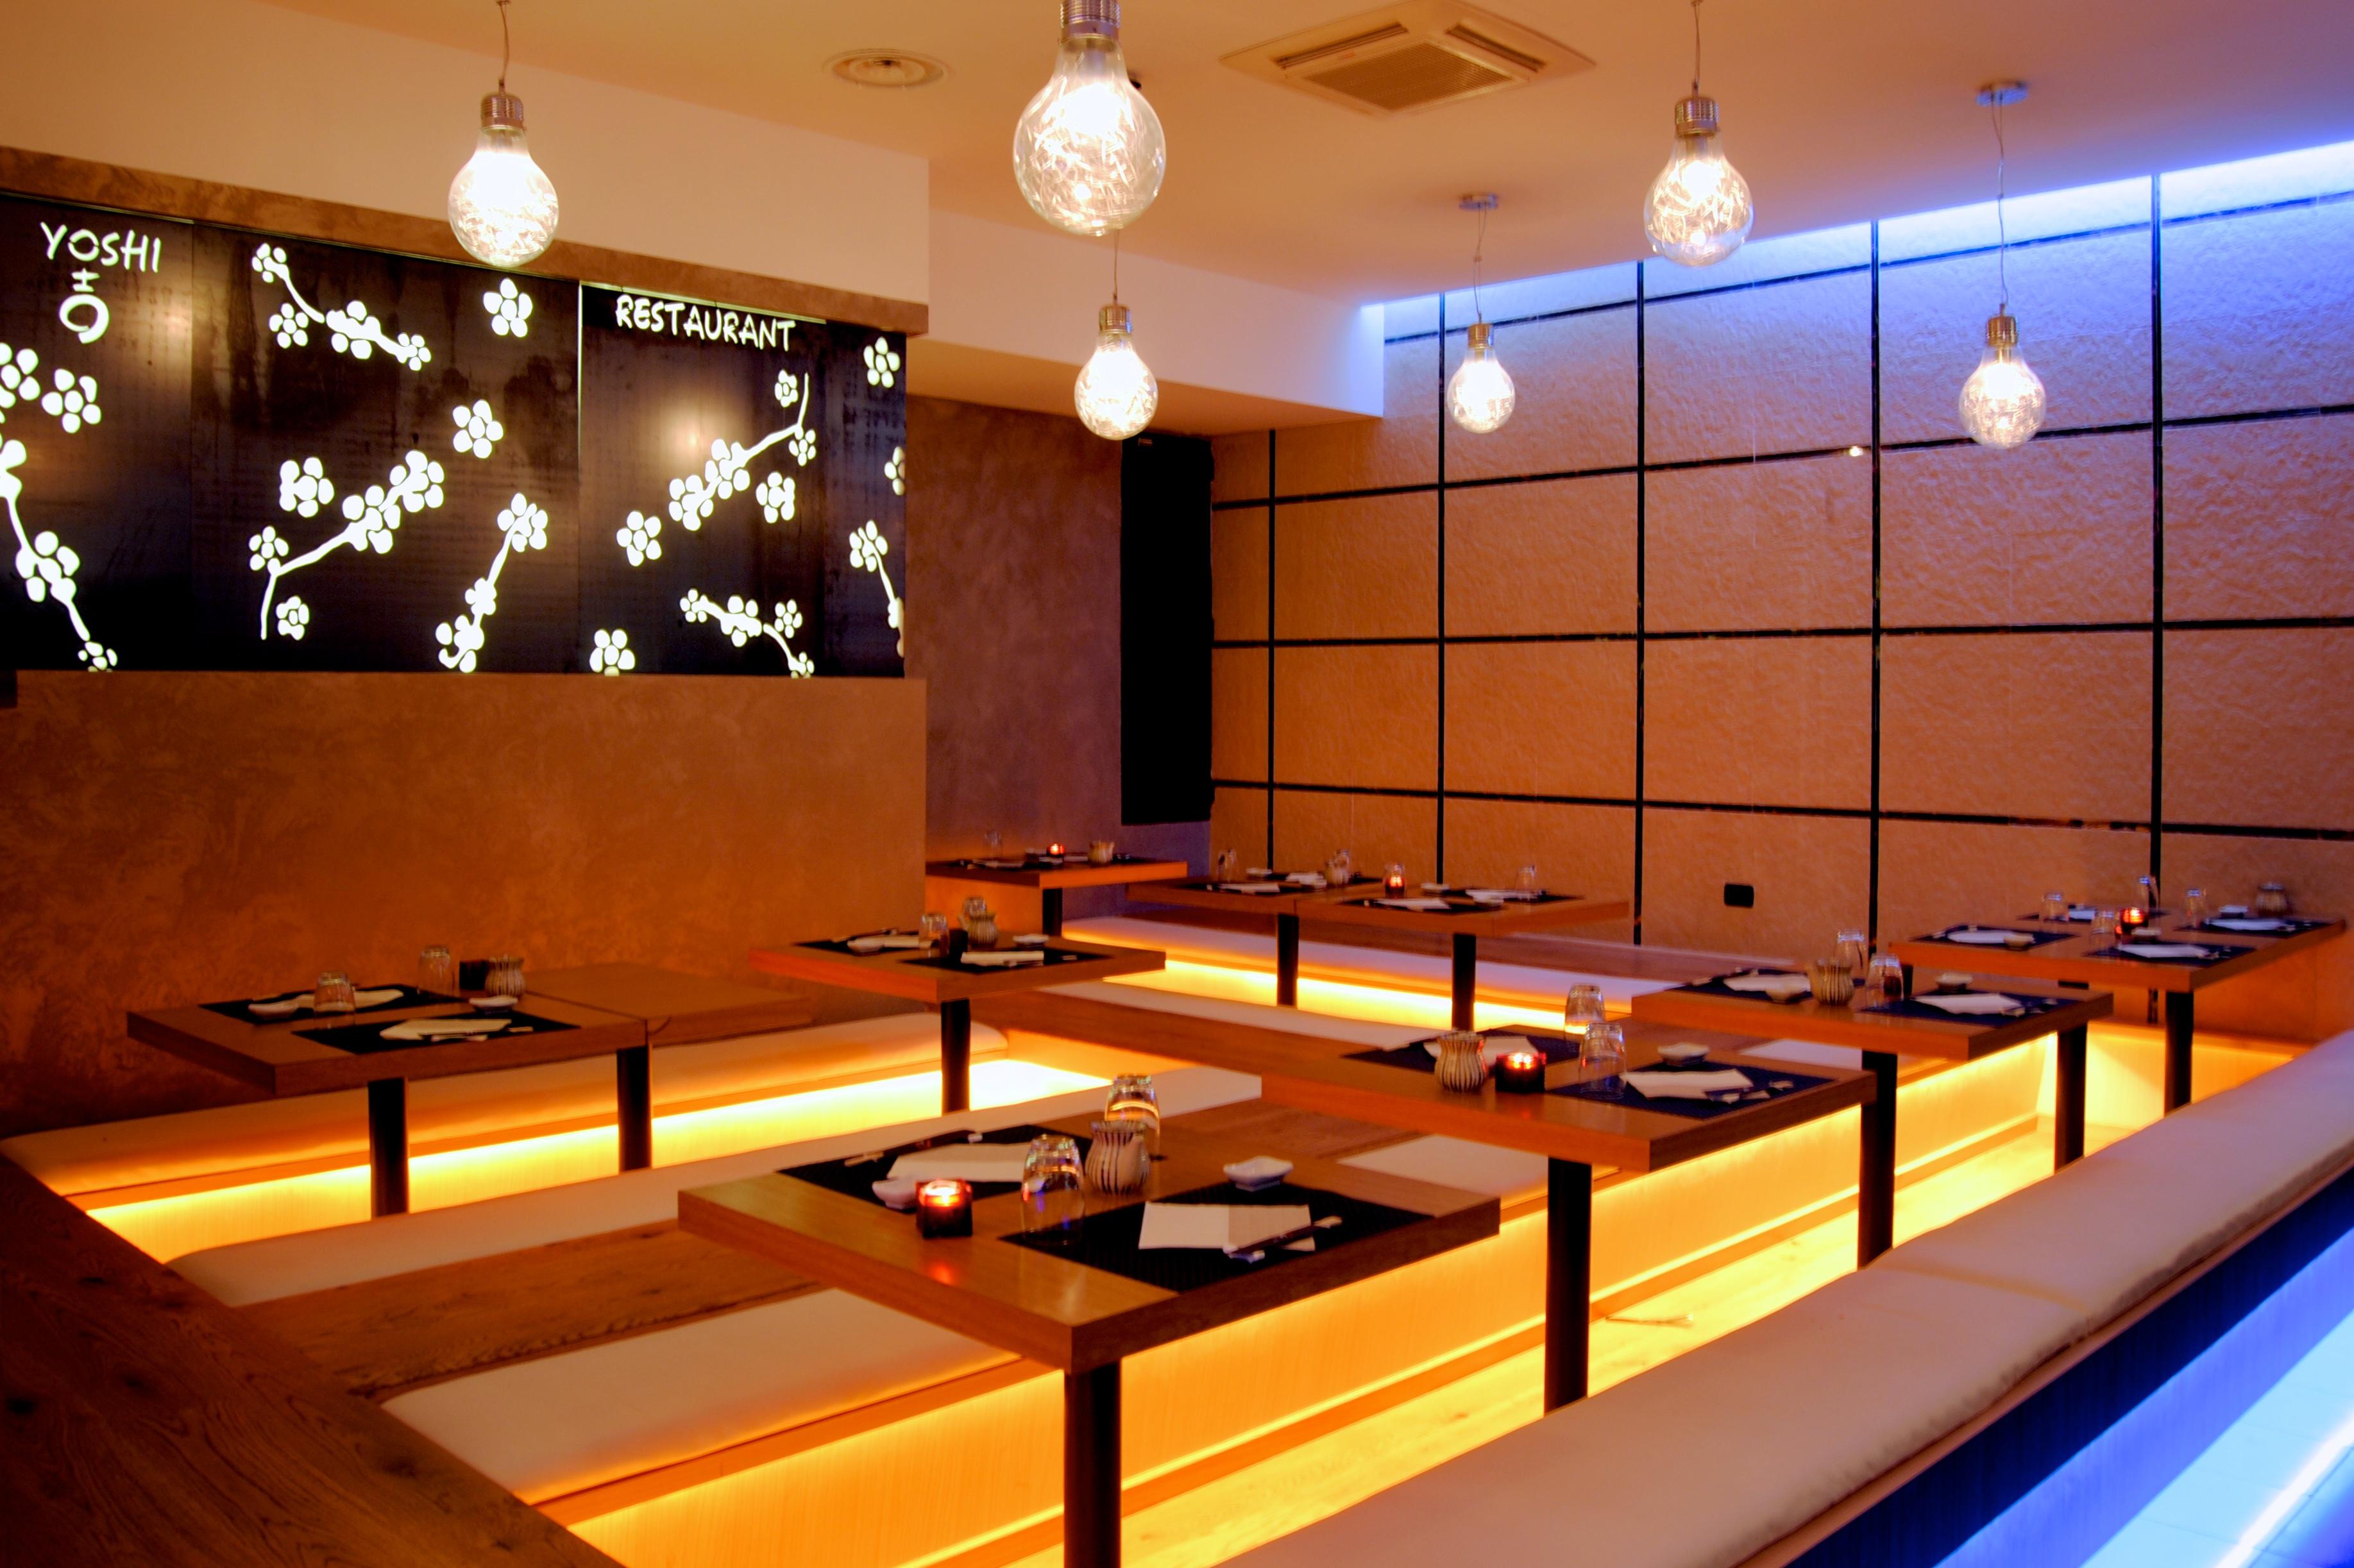 Usanze giapponesi a tavola yoshi ristorante giapponese - Tavolini giapponesi ...